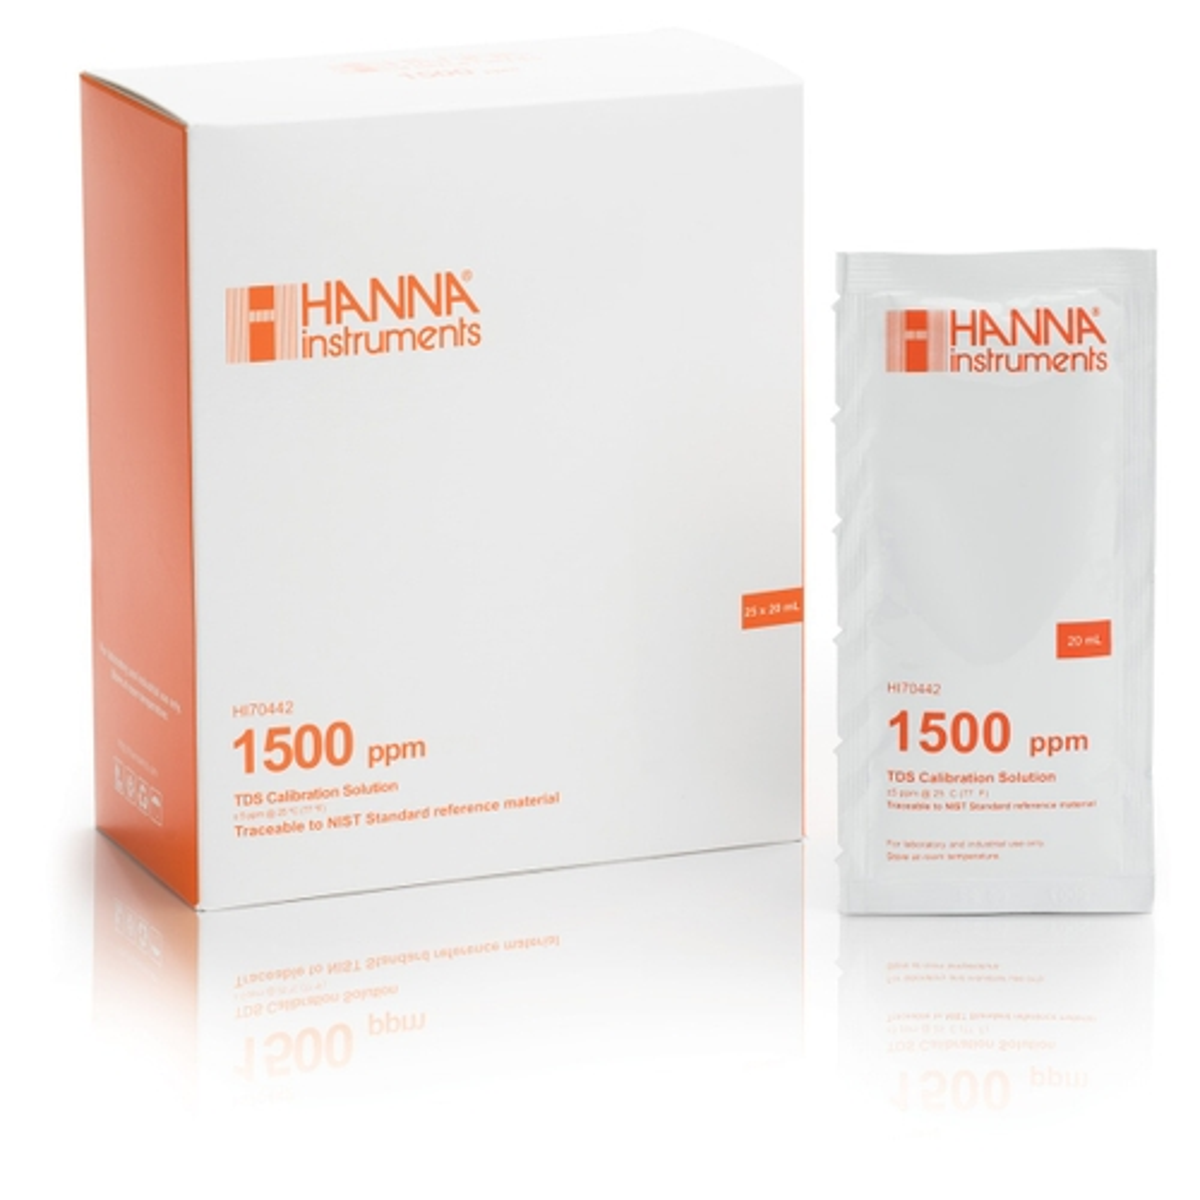 HI70442P 1500 mg/L (ppm) TDS (25 x 20 mL) sachets